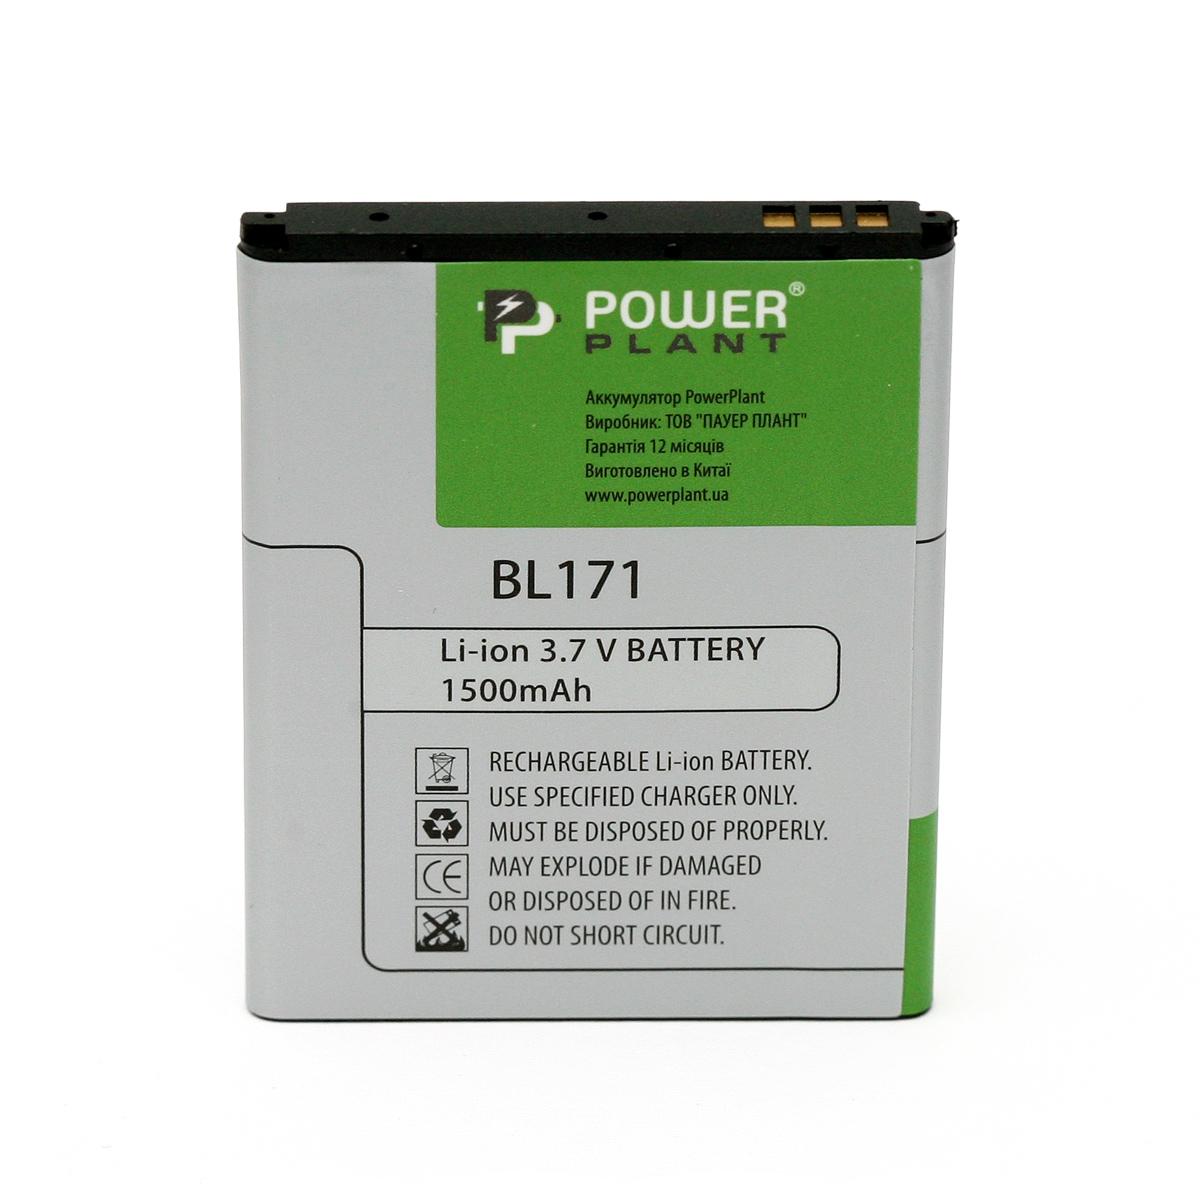 Купить Аккумулятор PowerPlant Lenovo A680 (BL171) 1500mAh